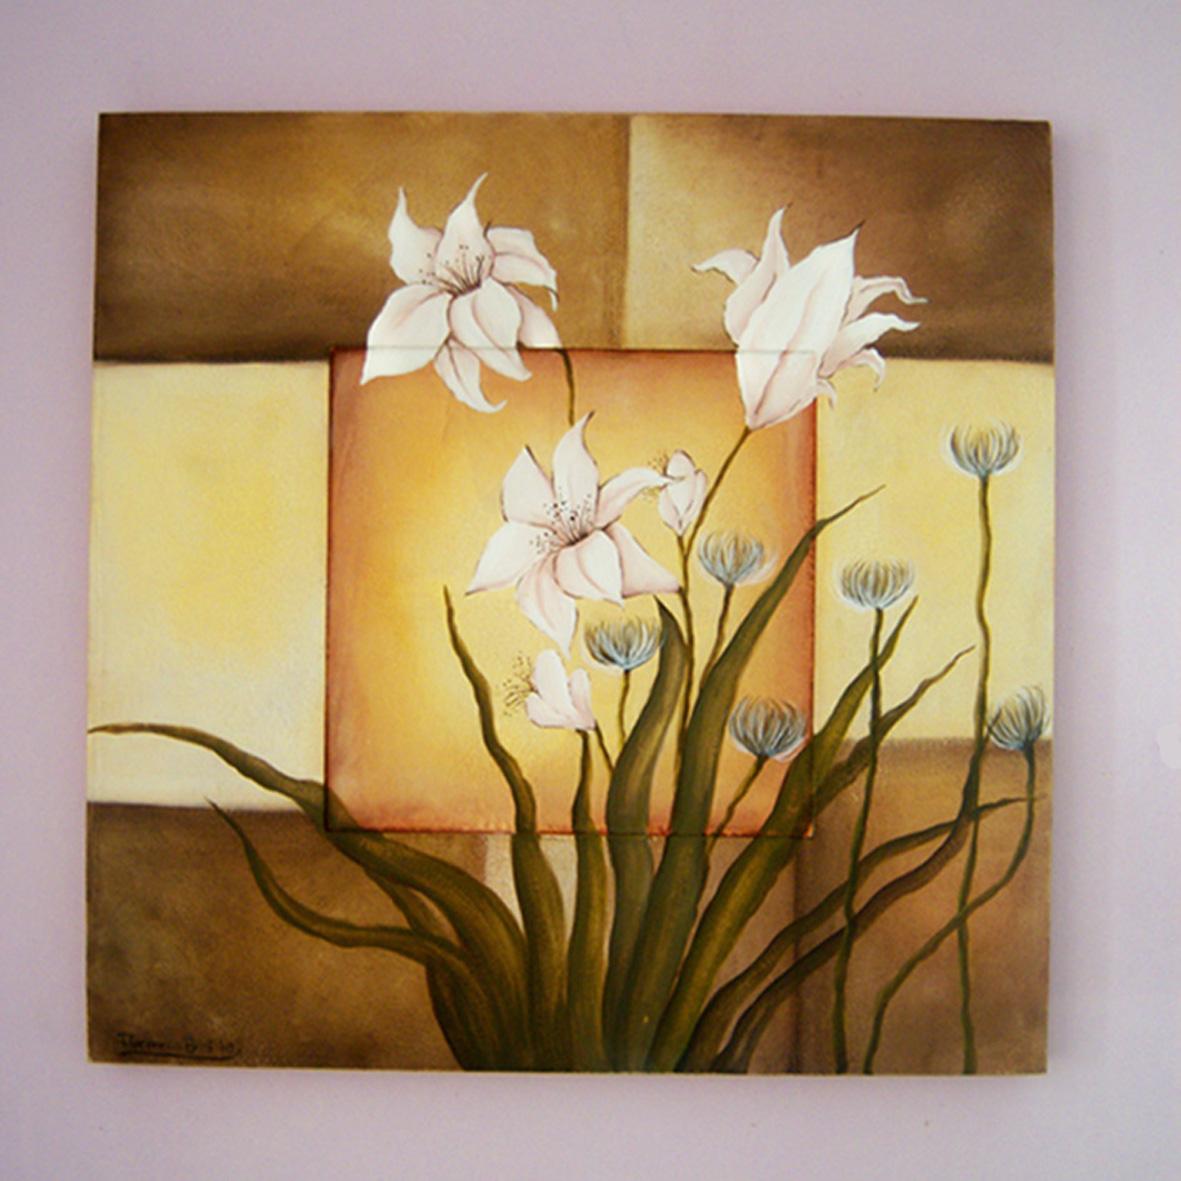 Pin de flores cuadros modernos al oleo pintura arte - Pintura cuadros modernos ...